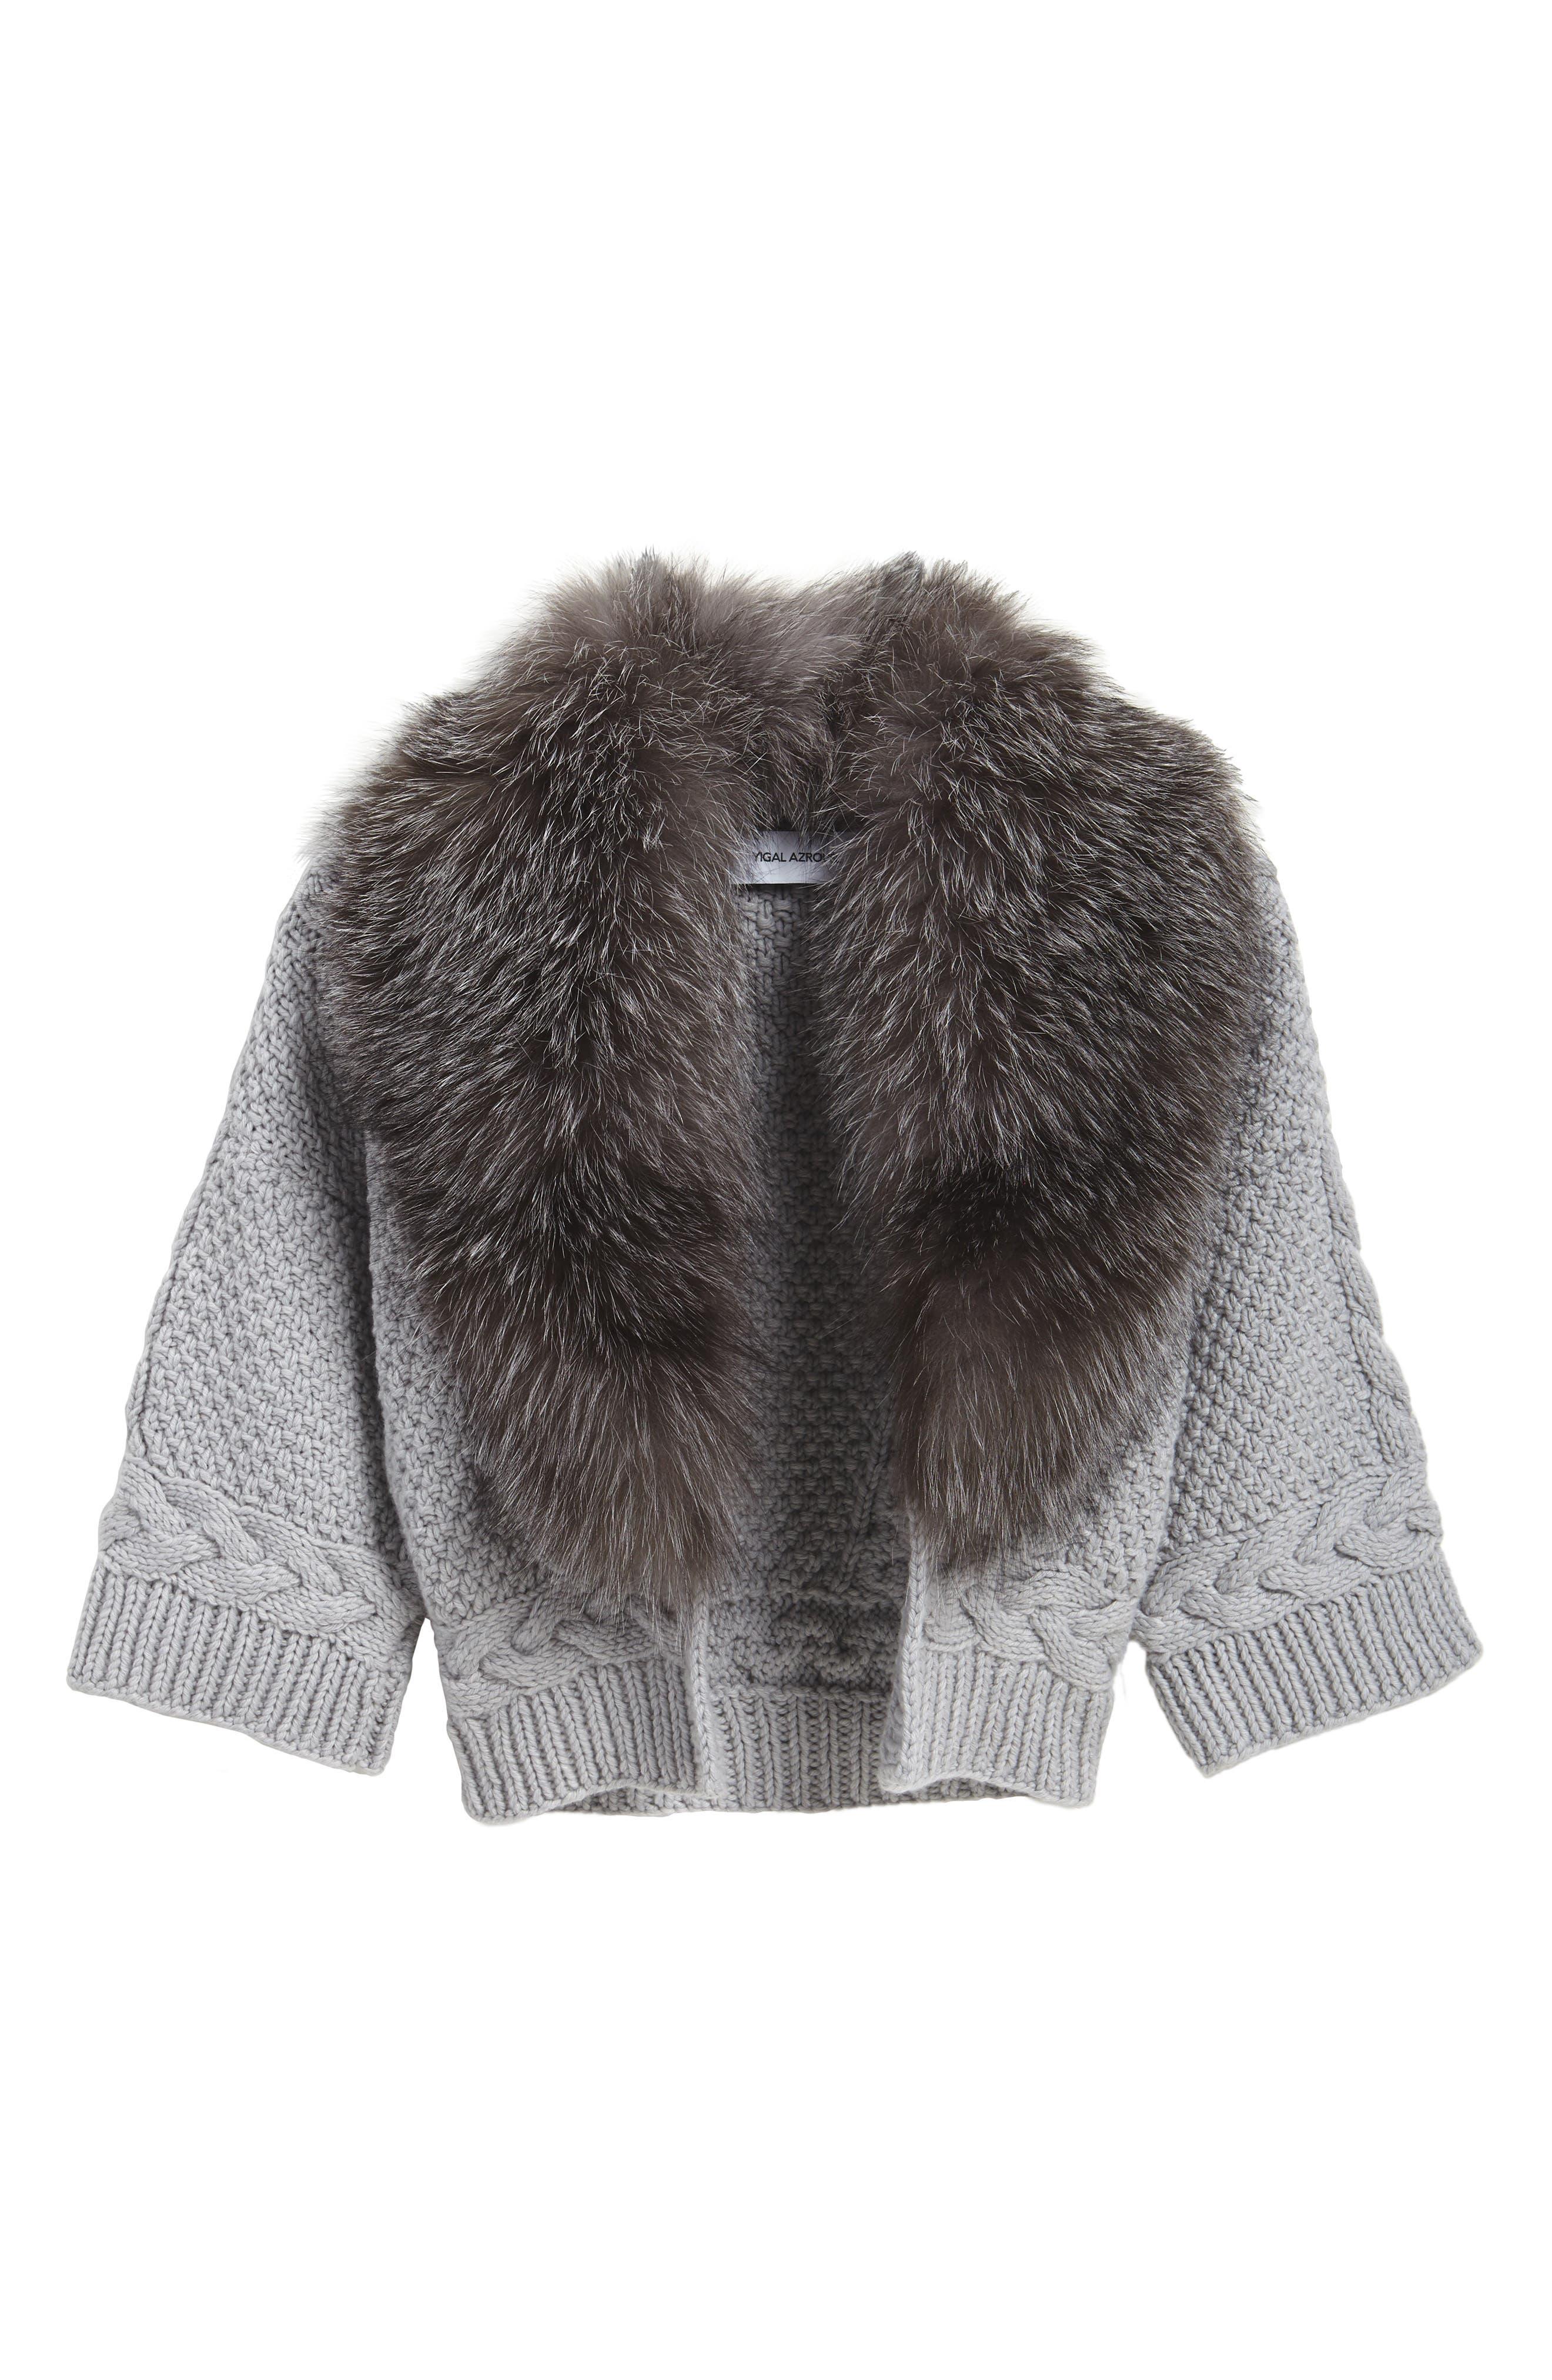 Merino Wool & Cashmere Knit Bolero with Removable Genuine Fox Fur Collar,                             Alternate thumbnail 5, color,                             087